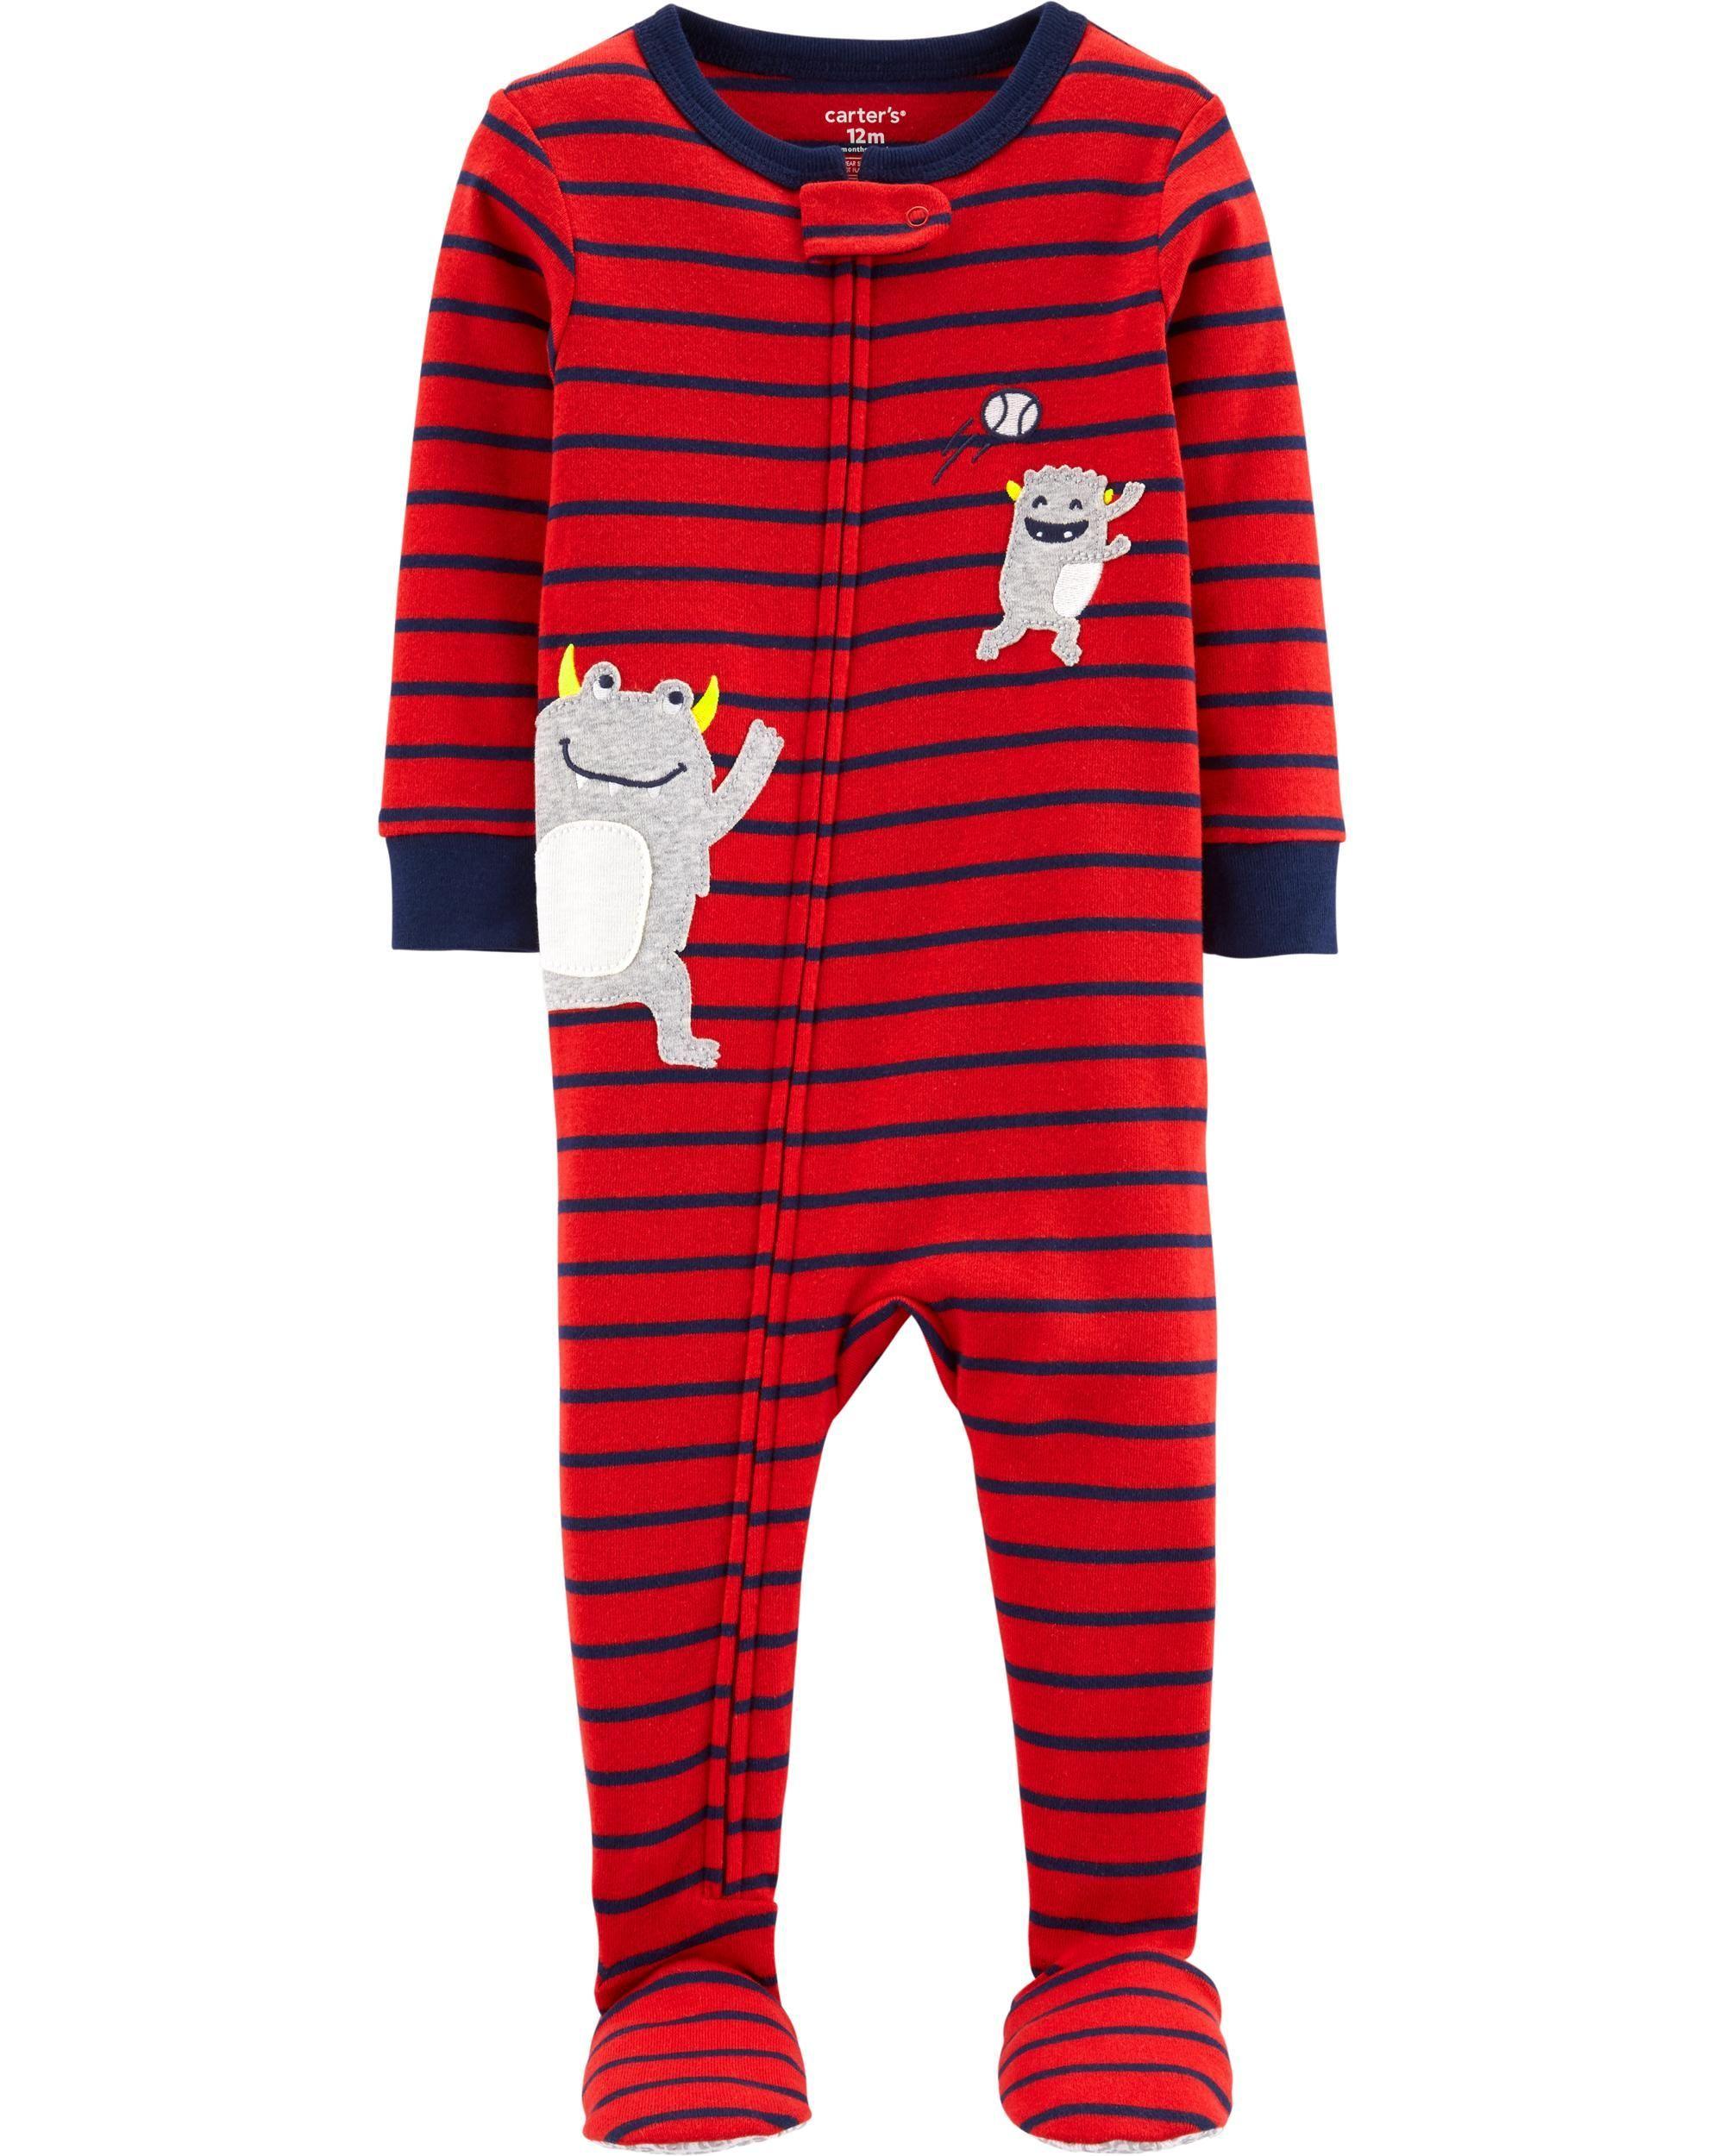 99a68c40ed62 Toddler Boy 1-Piece Monster Baseball Snug Fit Cotton Footie PJs ...